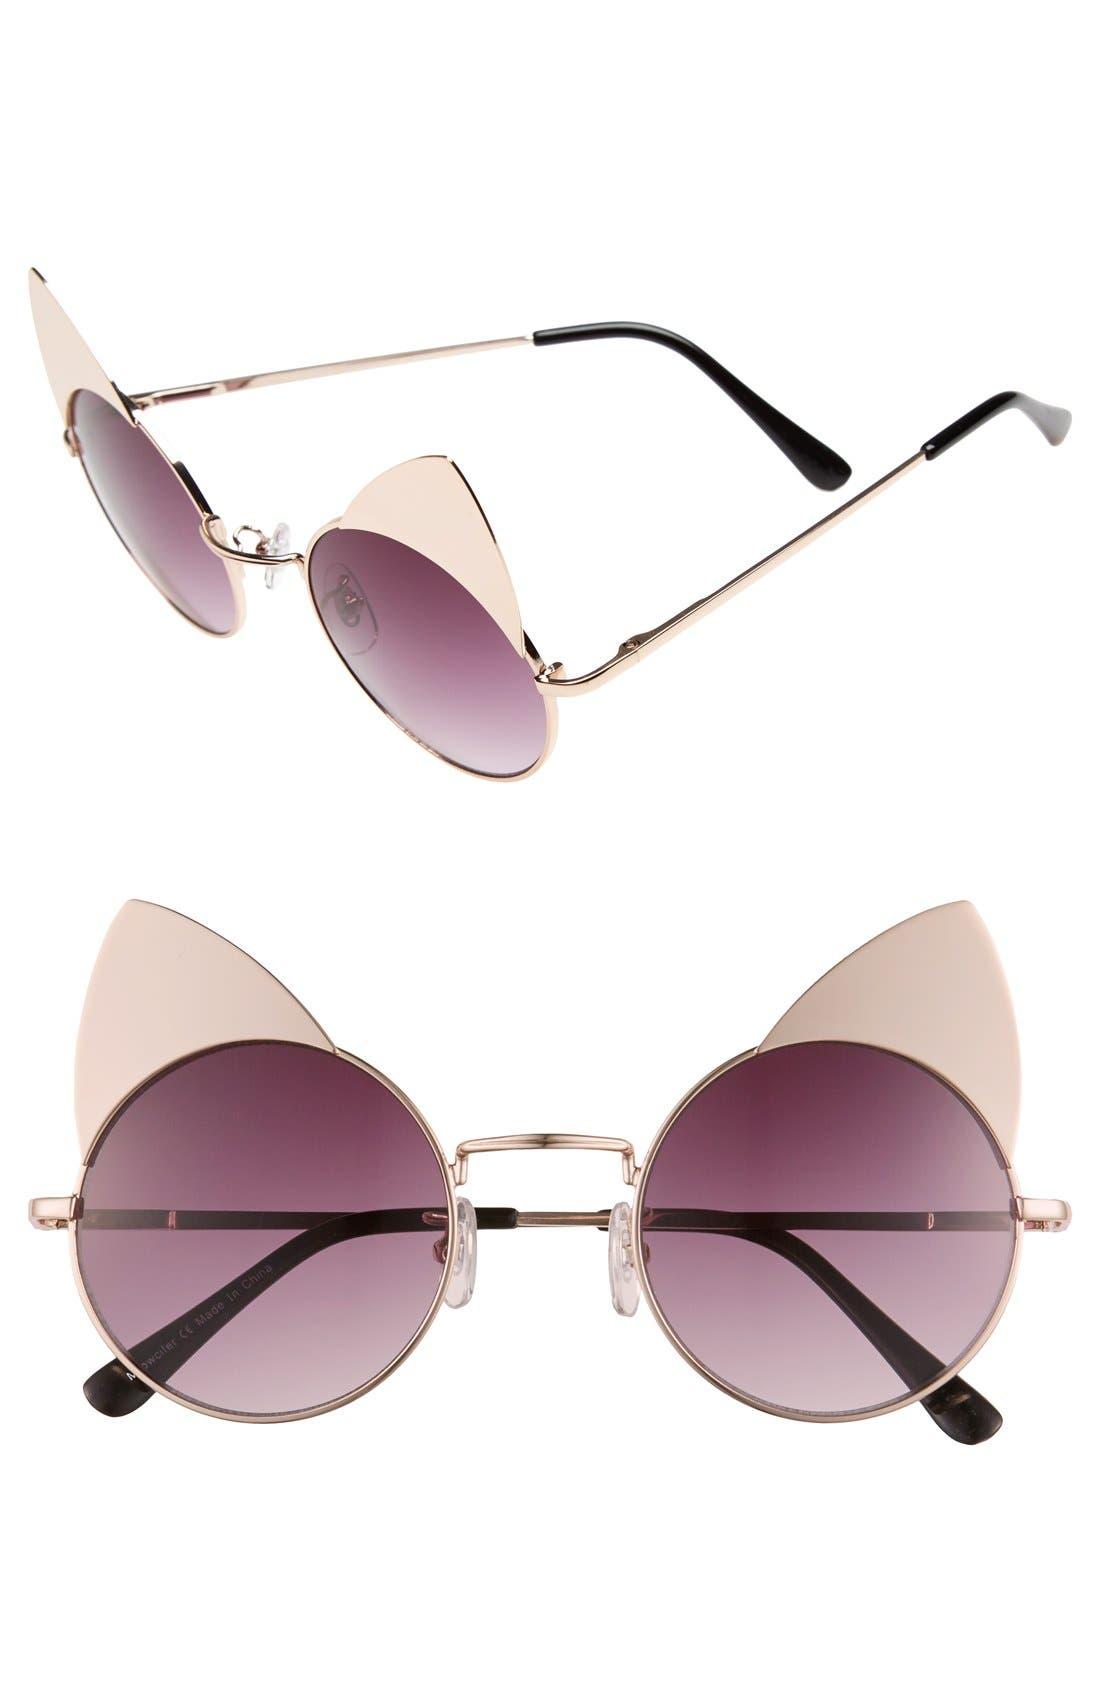 Main Image - Sunscape 'Meowcifer' 50mm Metal Sunglasses